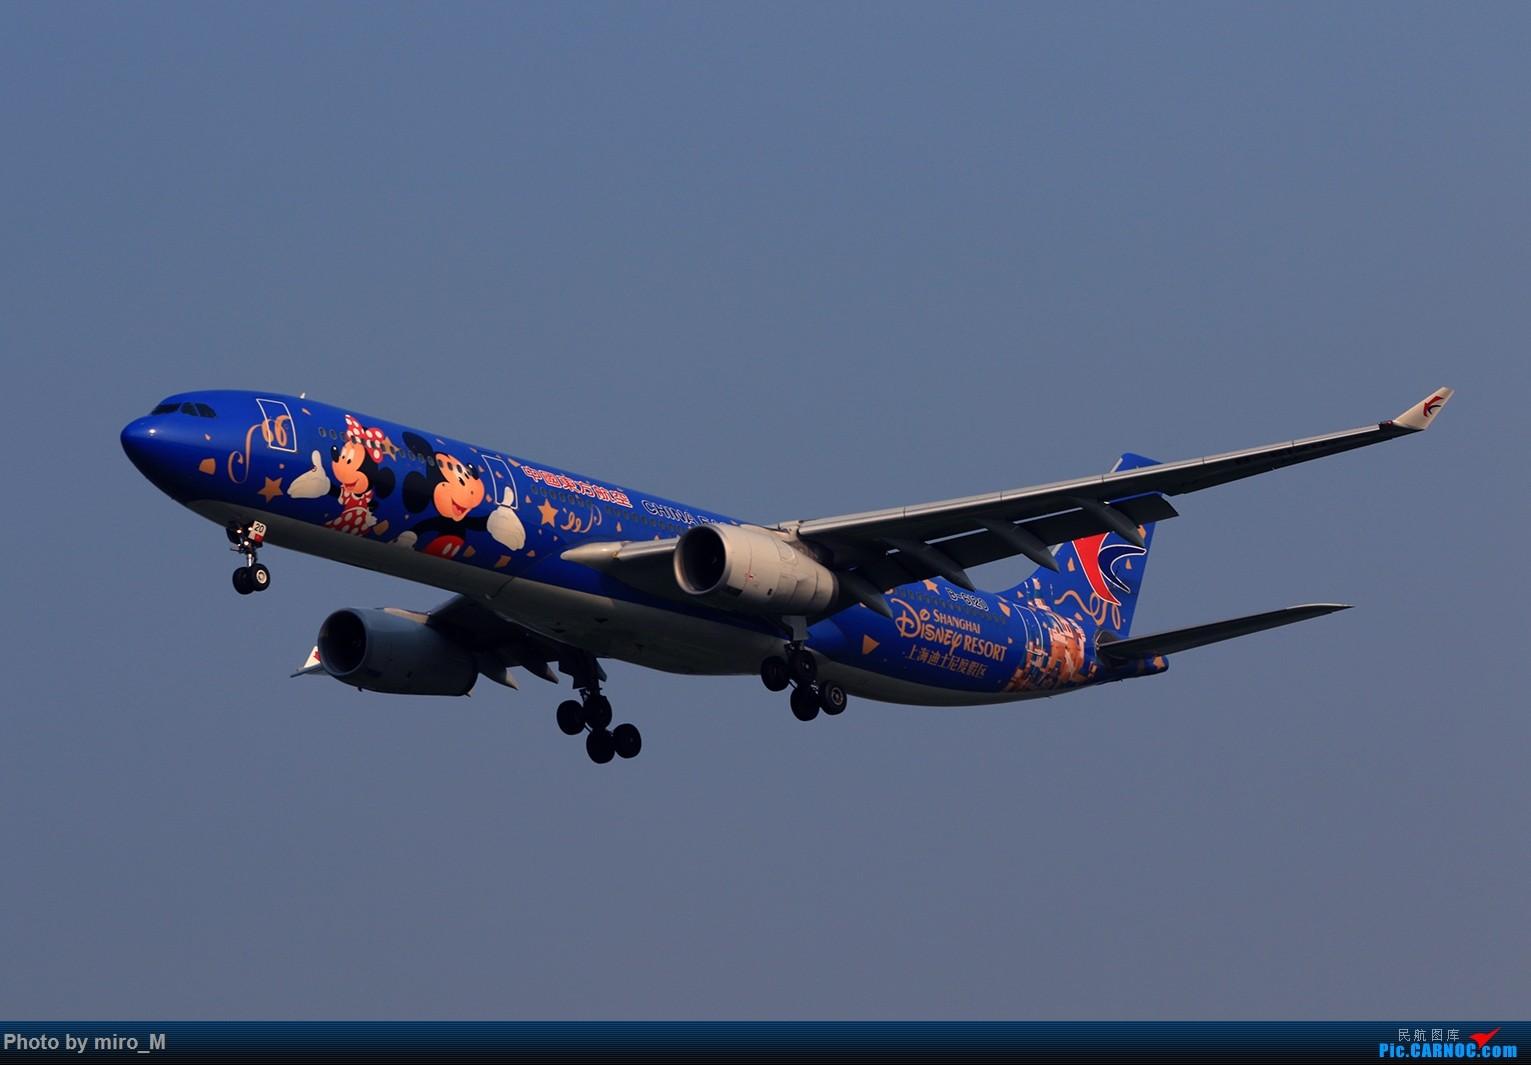 Re:欧洲浪了一圈,CS100,BAE146,fokker70等新老机型串着飞+ZRH,MUC,FRA,AMS,TLS拍机 AIRBUS A330-300 B-6120 中国北京首都国际机场